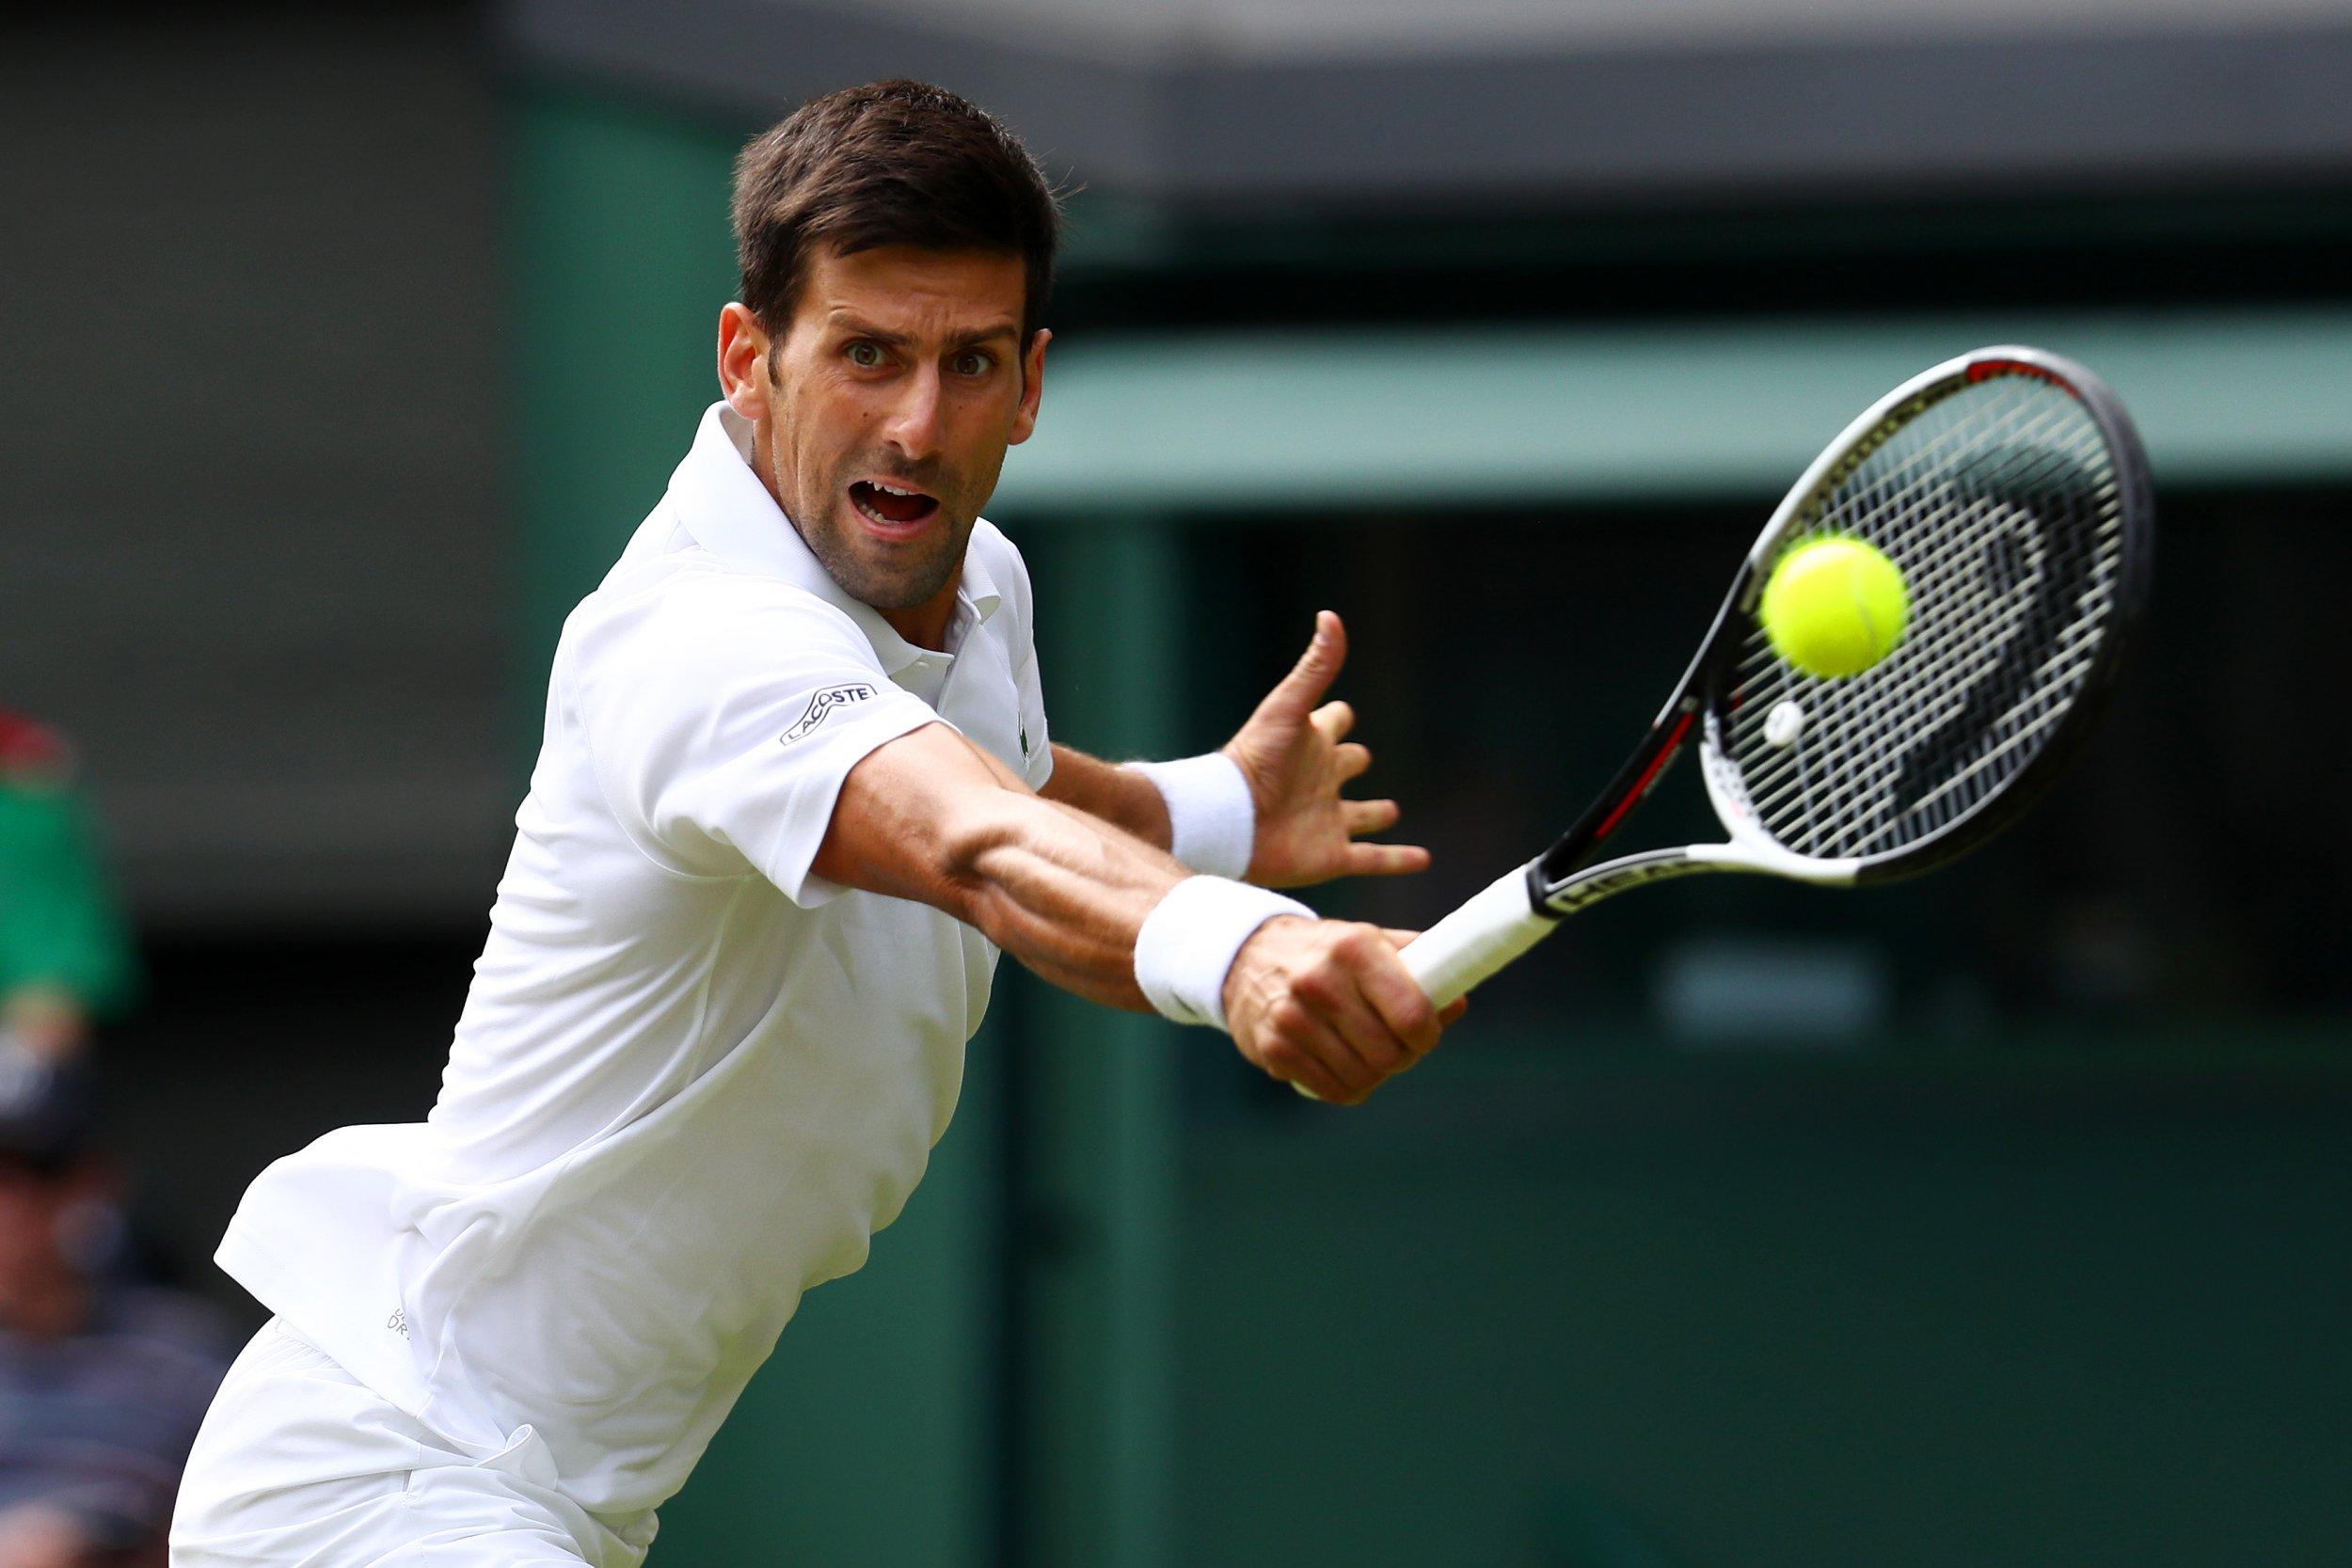 John McEnroe: 'Distracted' Novak Djokovic Reminds Me of